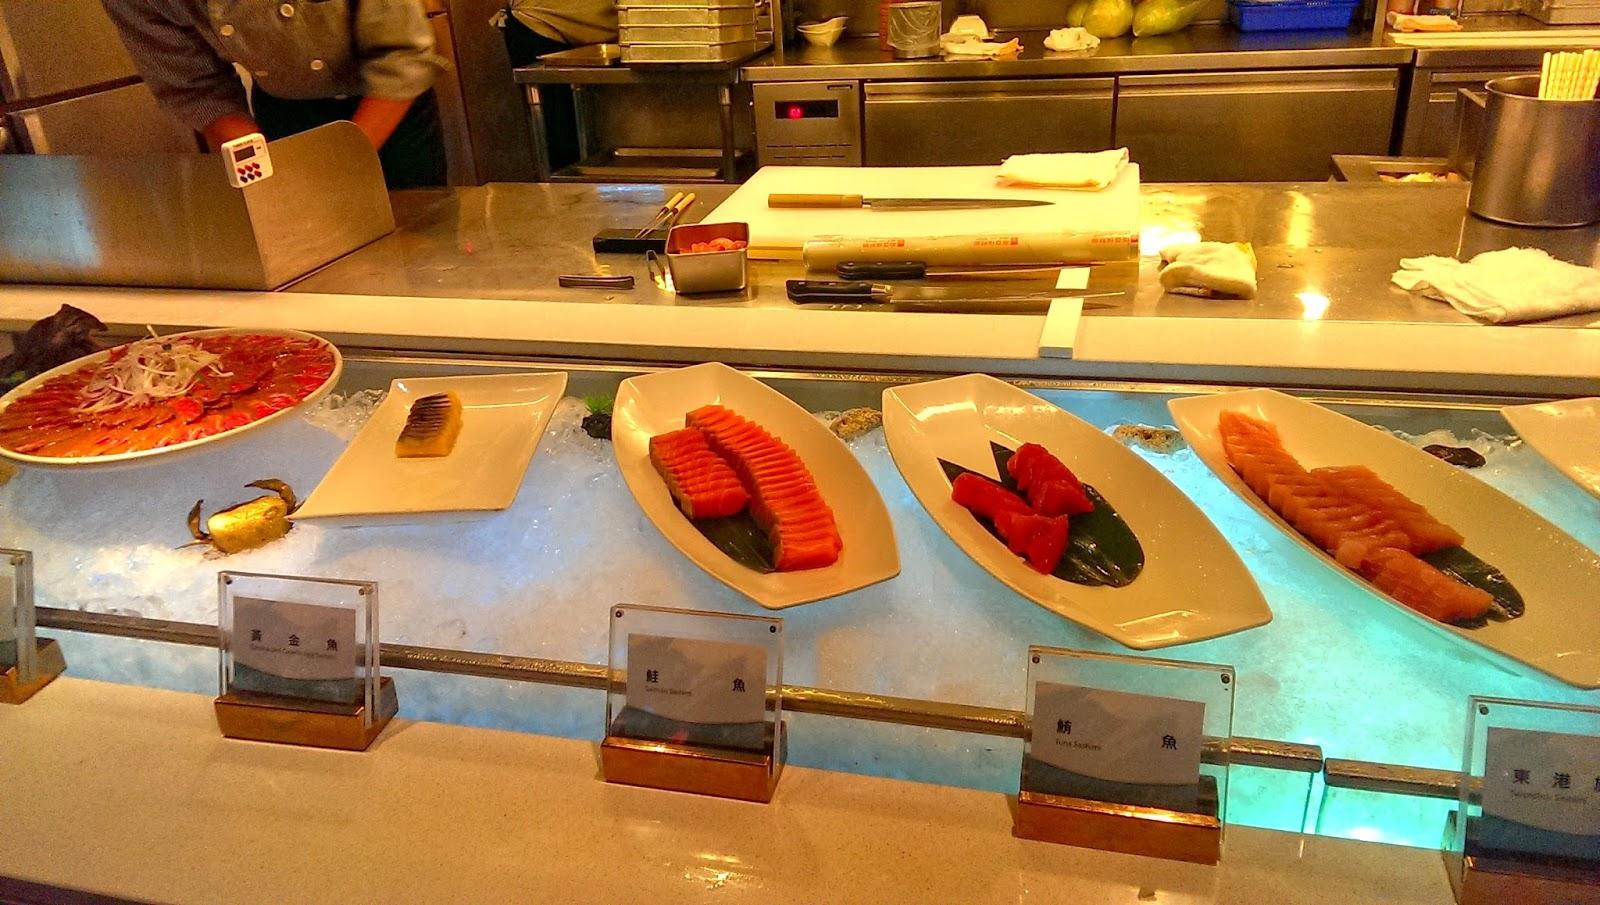 2015 07 01%2B19.15.20 - [食記] 台北京站 - 饗食天堂,有生魚片吃到飽的高級自助餐廳!